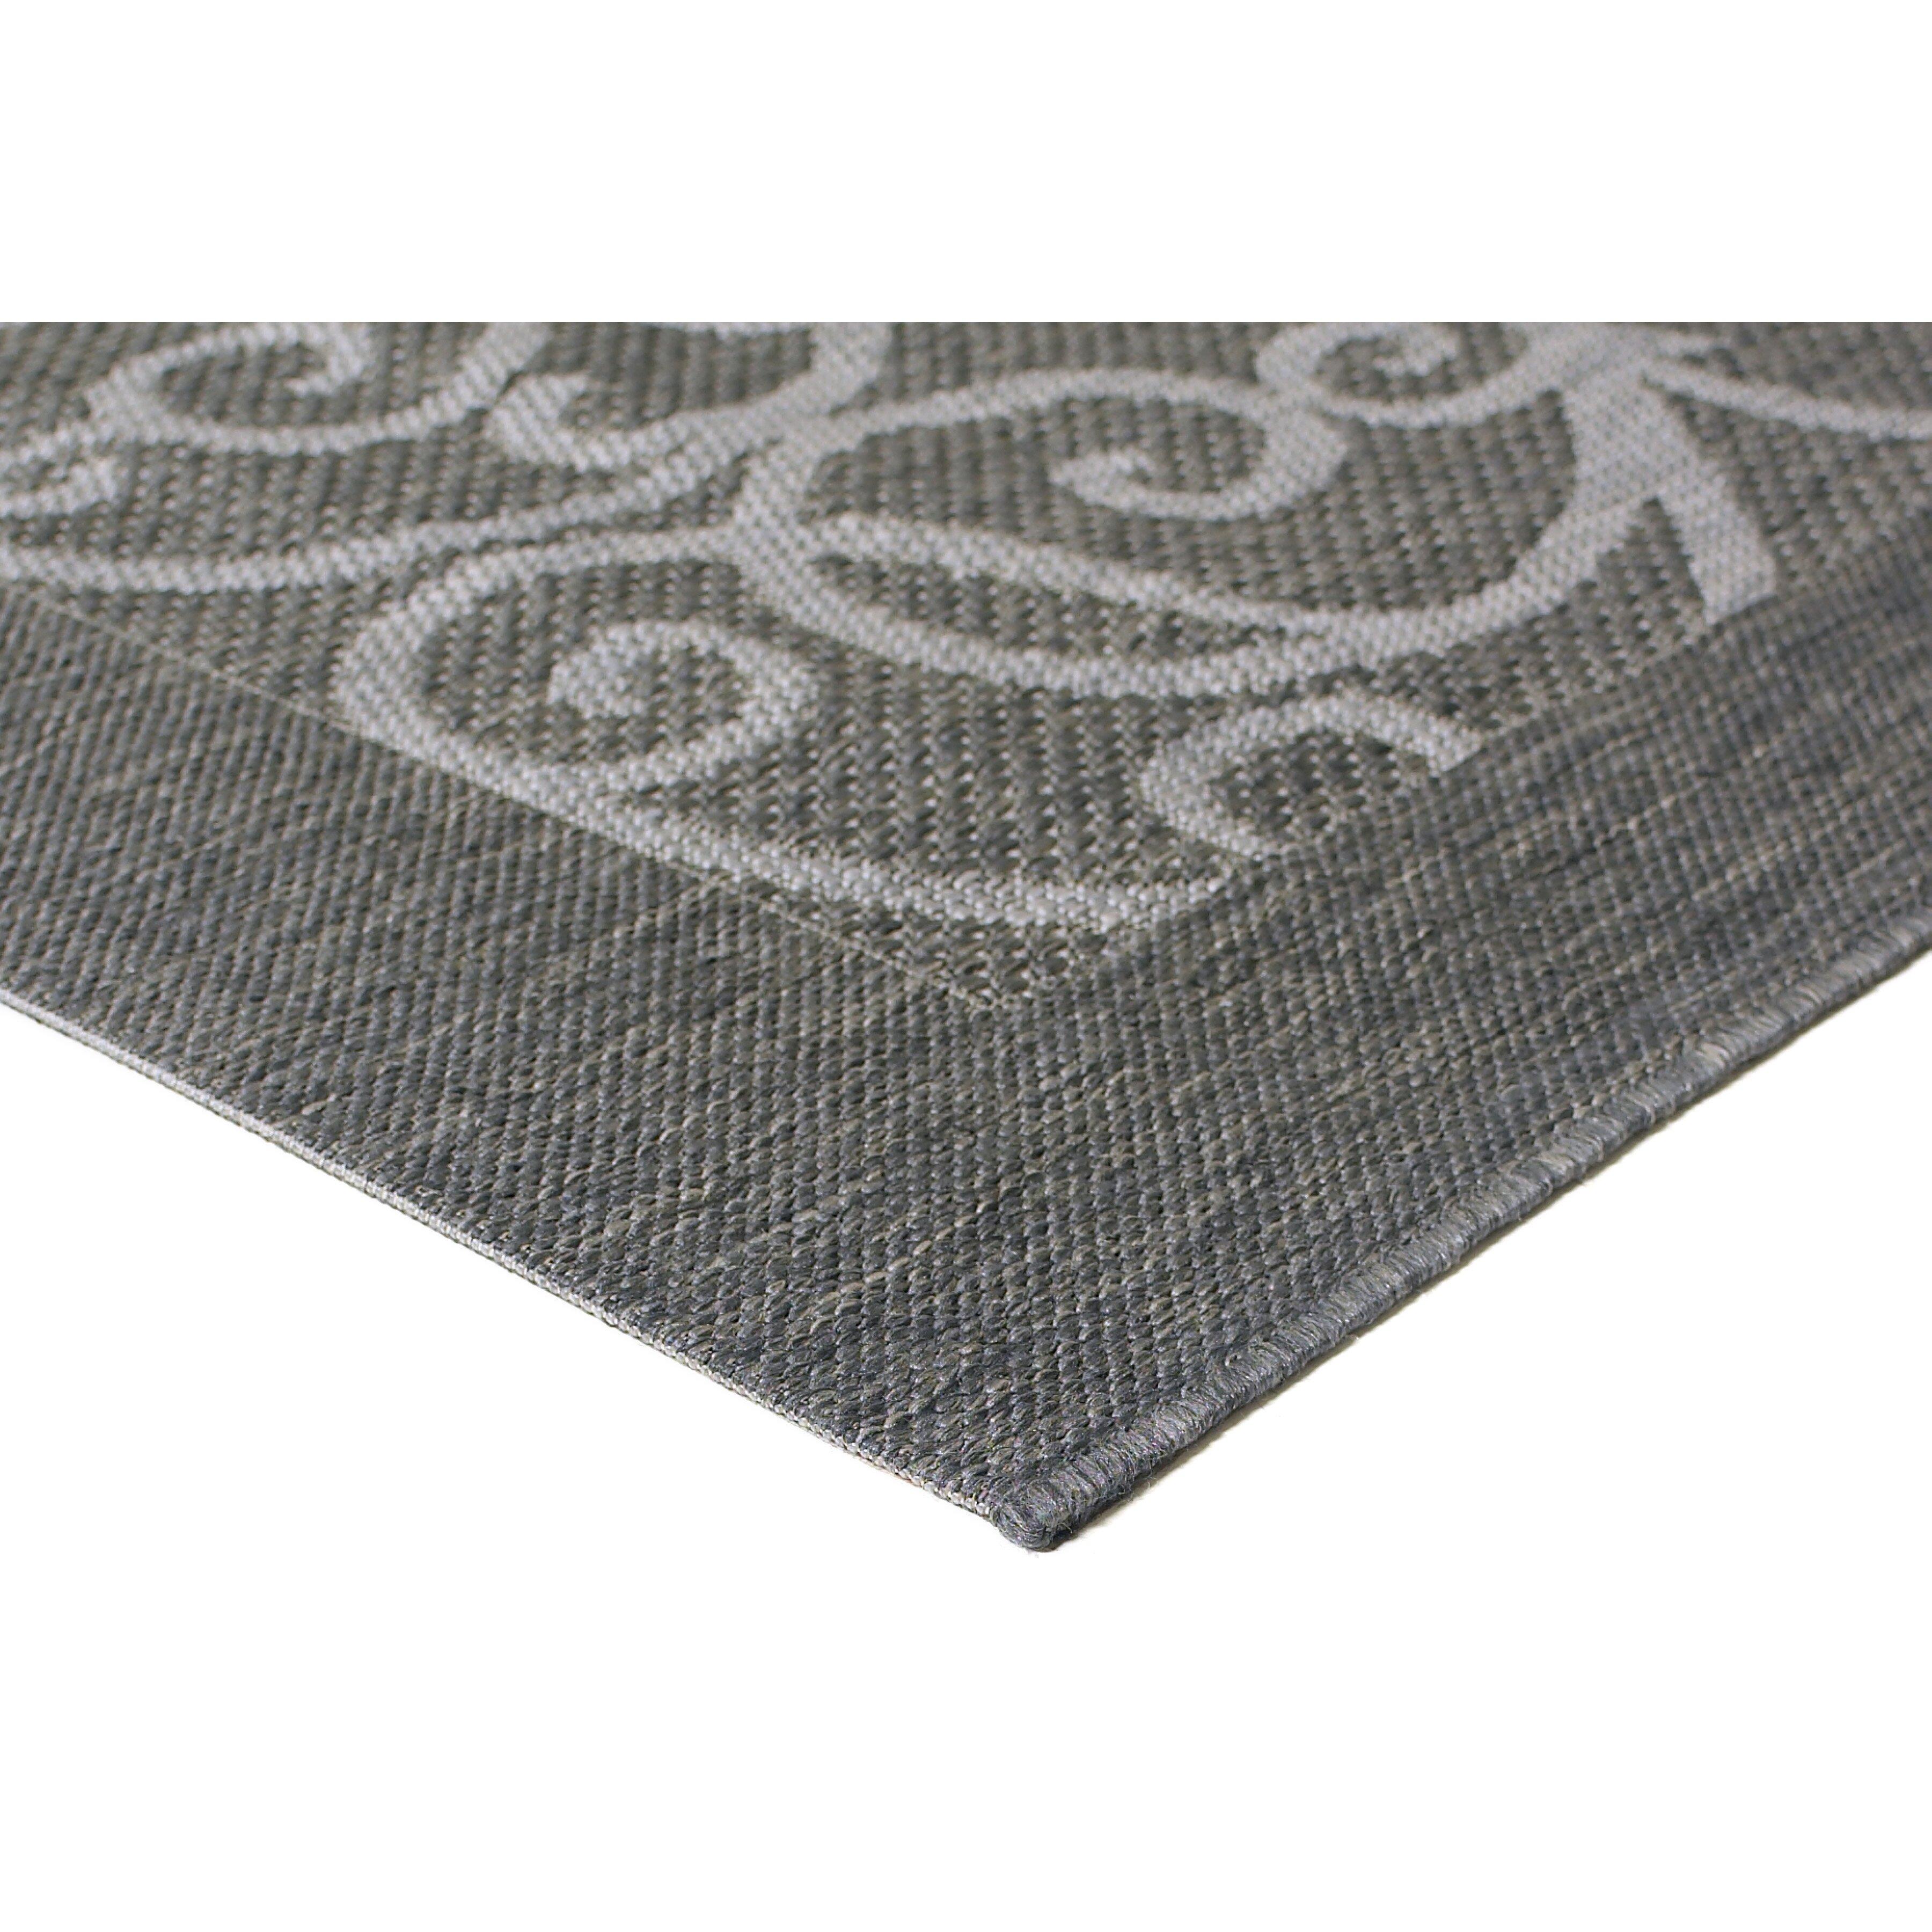 Balta charleston grey indoor outdoor area rug reviews for Landscape indoor area rug